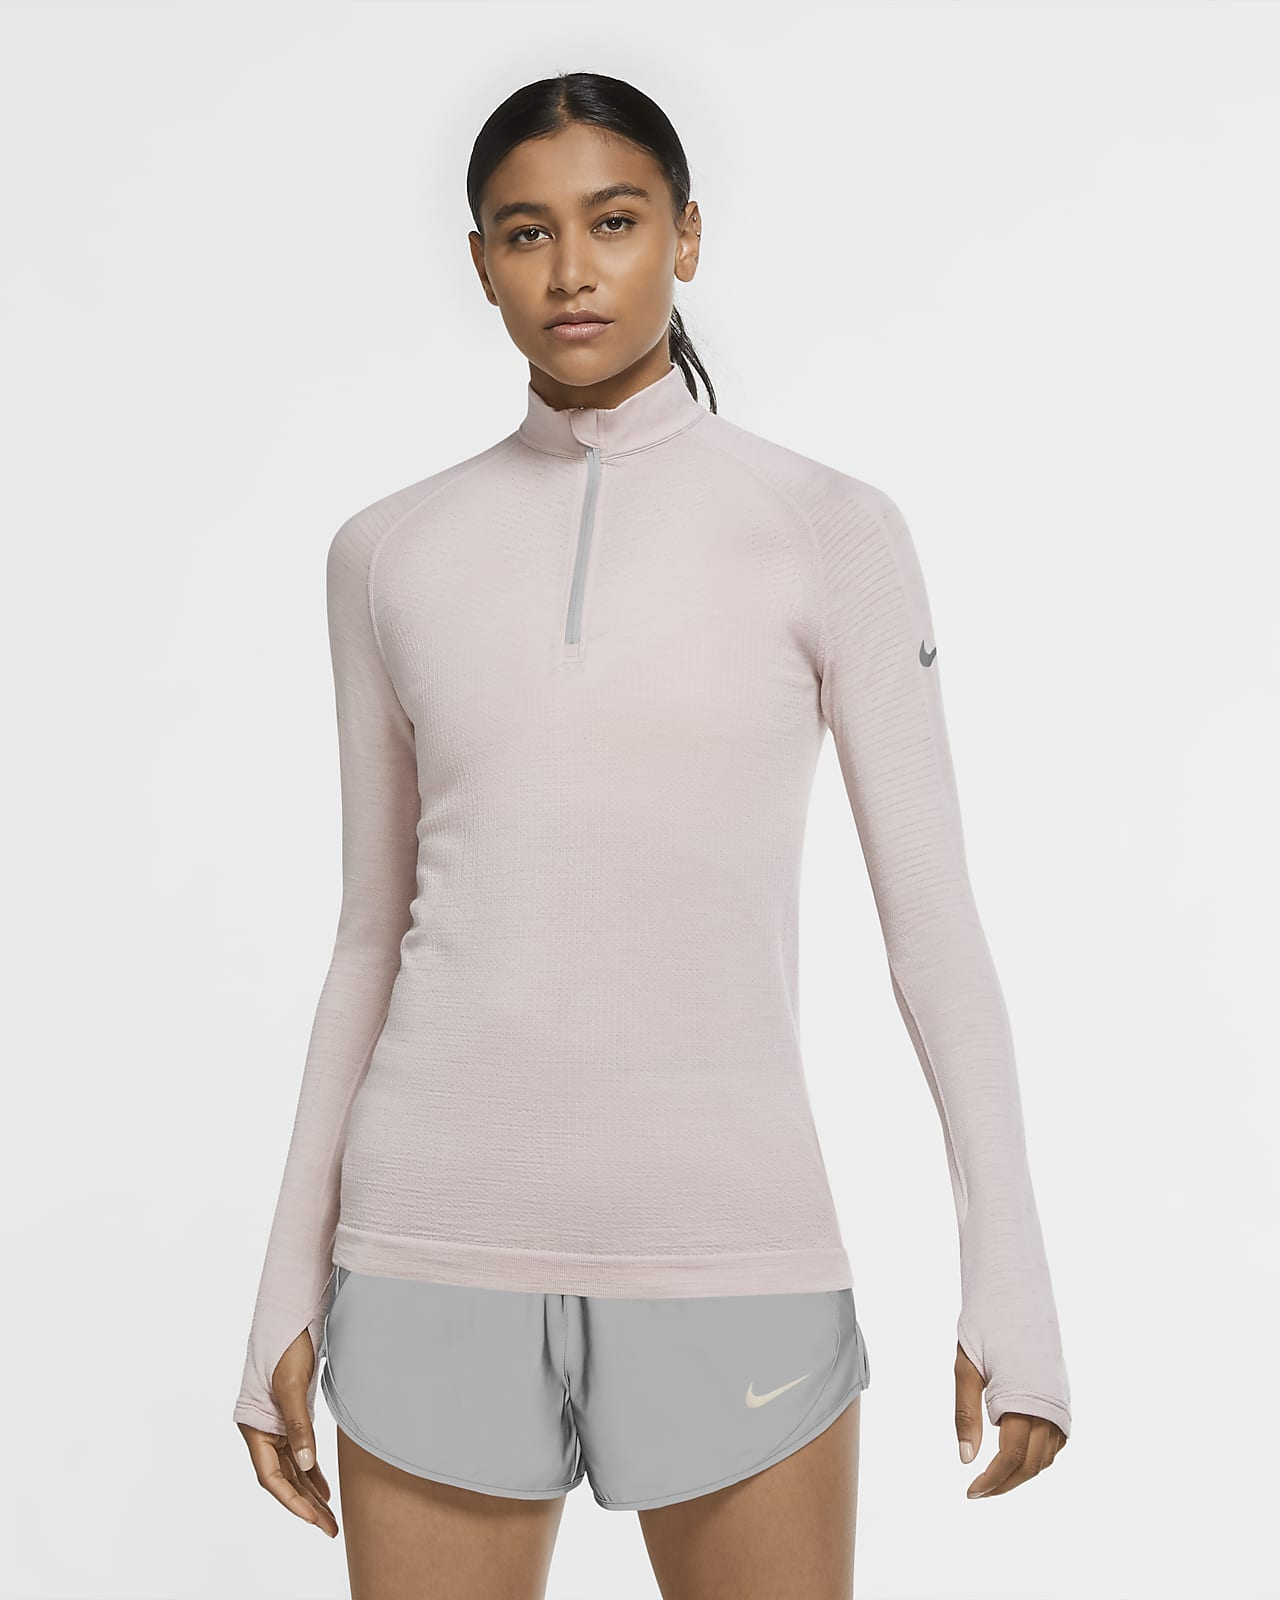 Nike Run Division Women's 1/2-Zip Wool Running Top